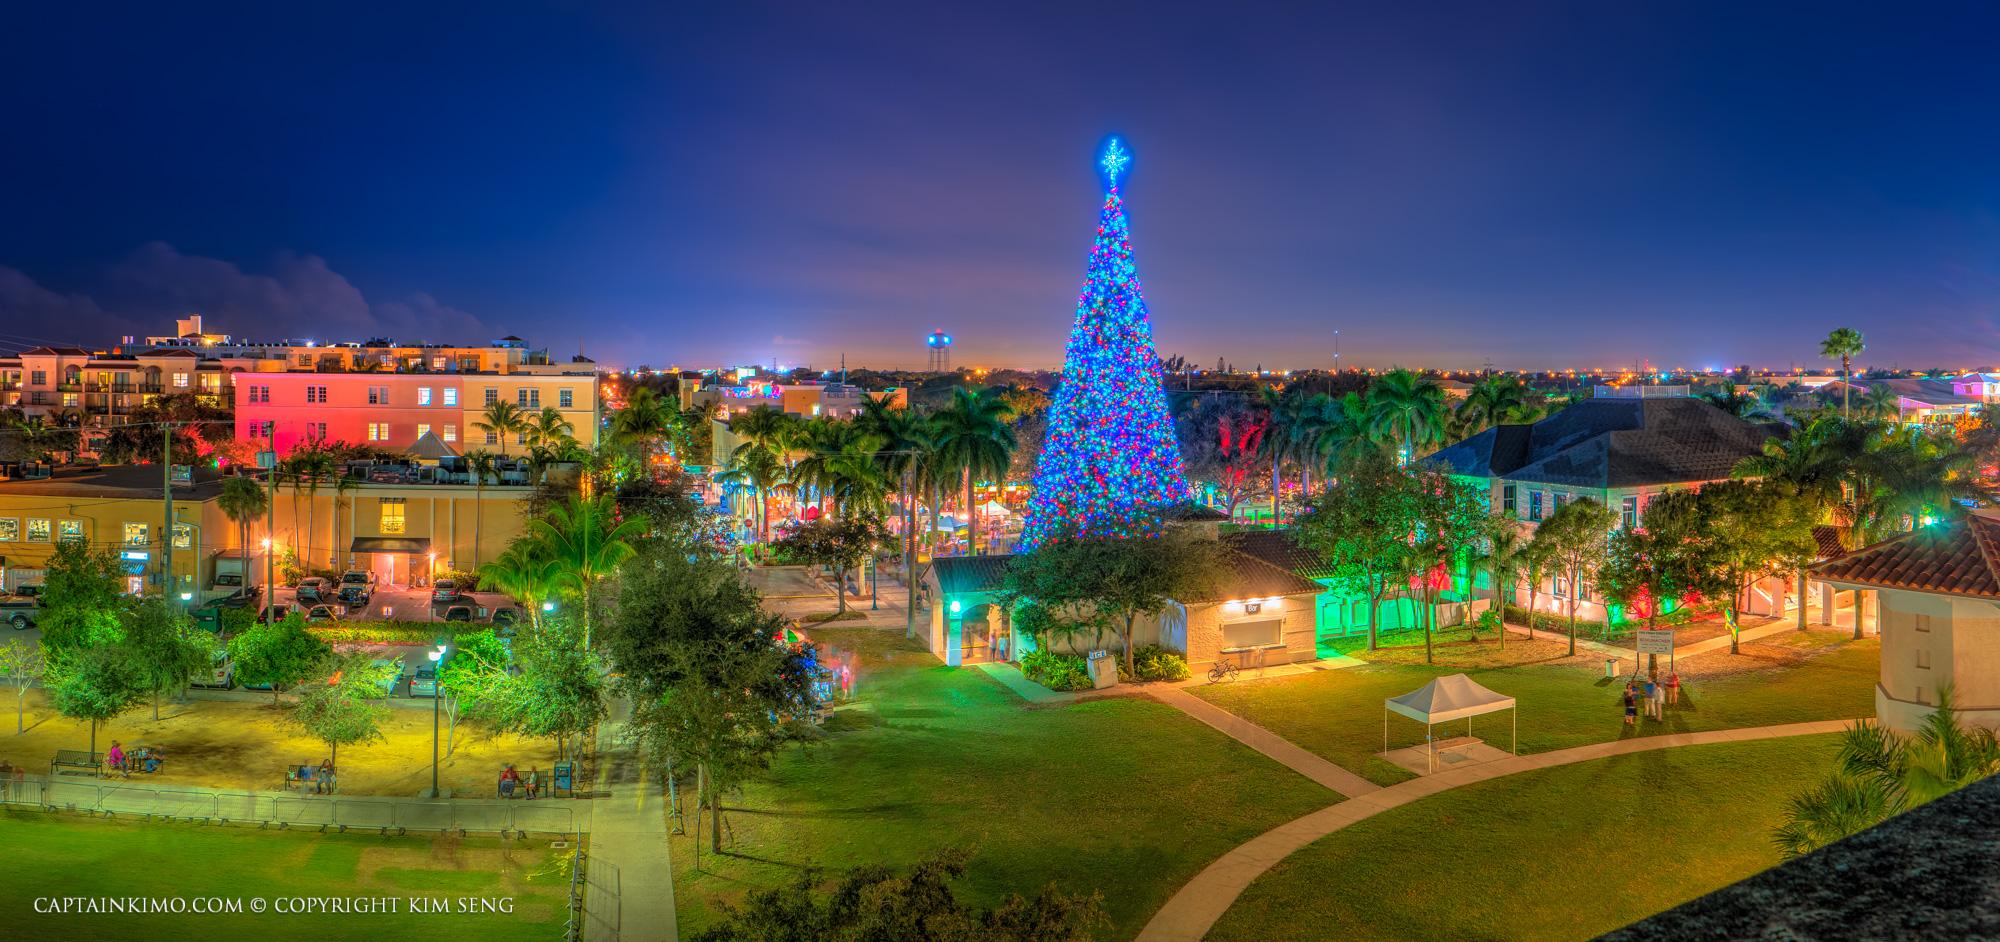 How Many Lights For A Christmas Tree Snug Harbor Drive Christmas Lights Palm Beach Gardens Top